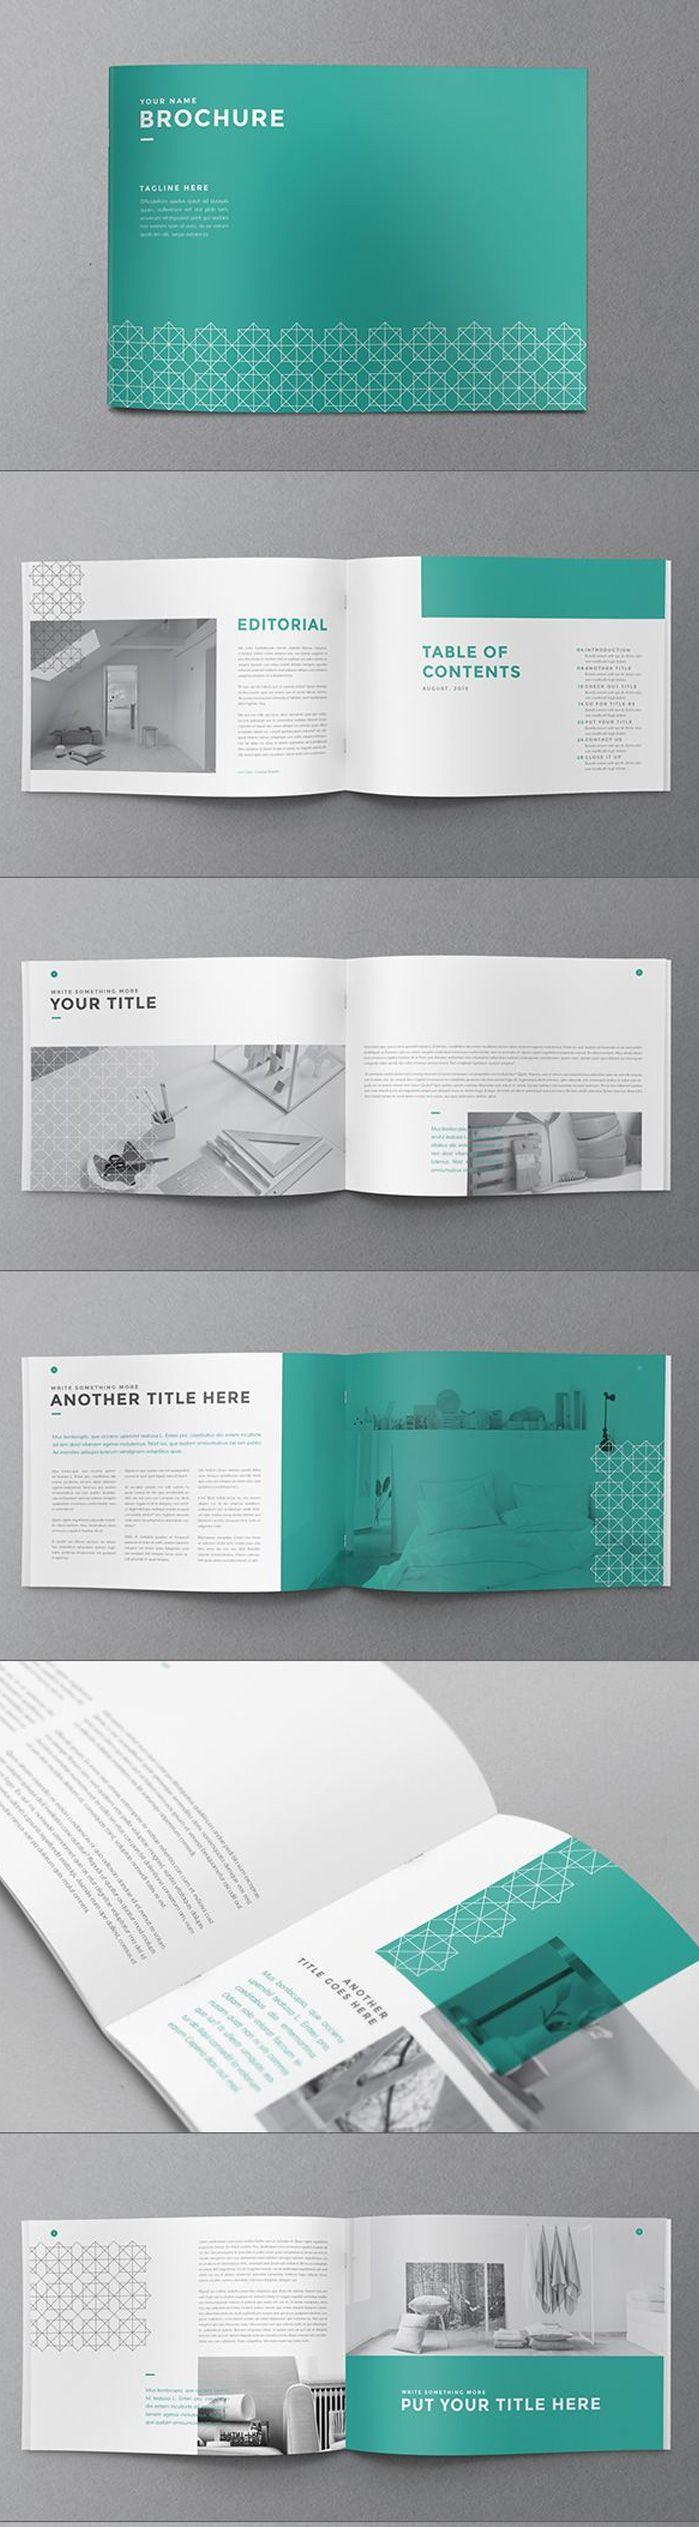 blog_diseño_grafico 2 | dibujos arquitectura | Pinterest ...